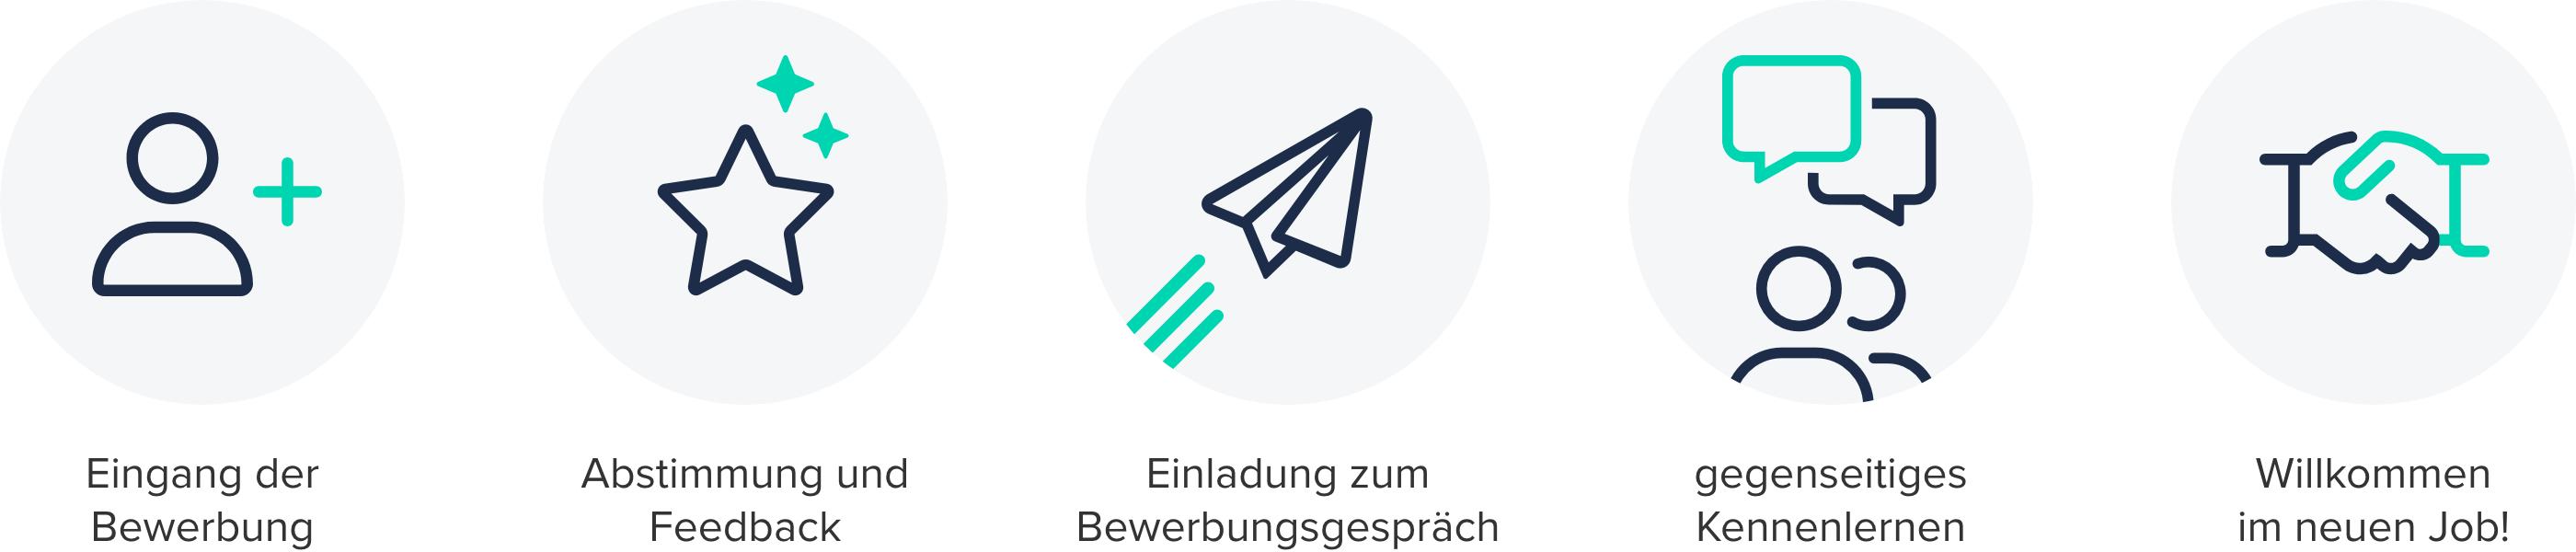 Connectoor-Bewerbungsprozess